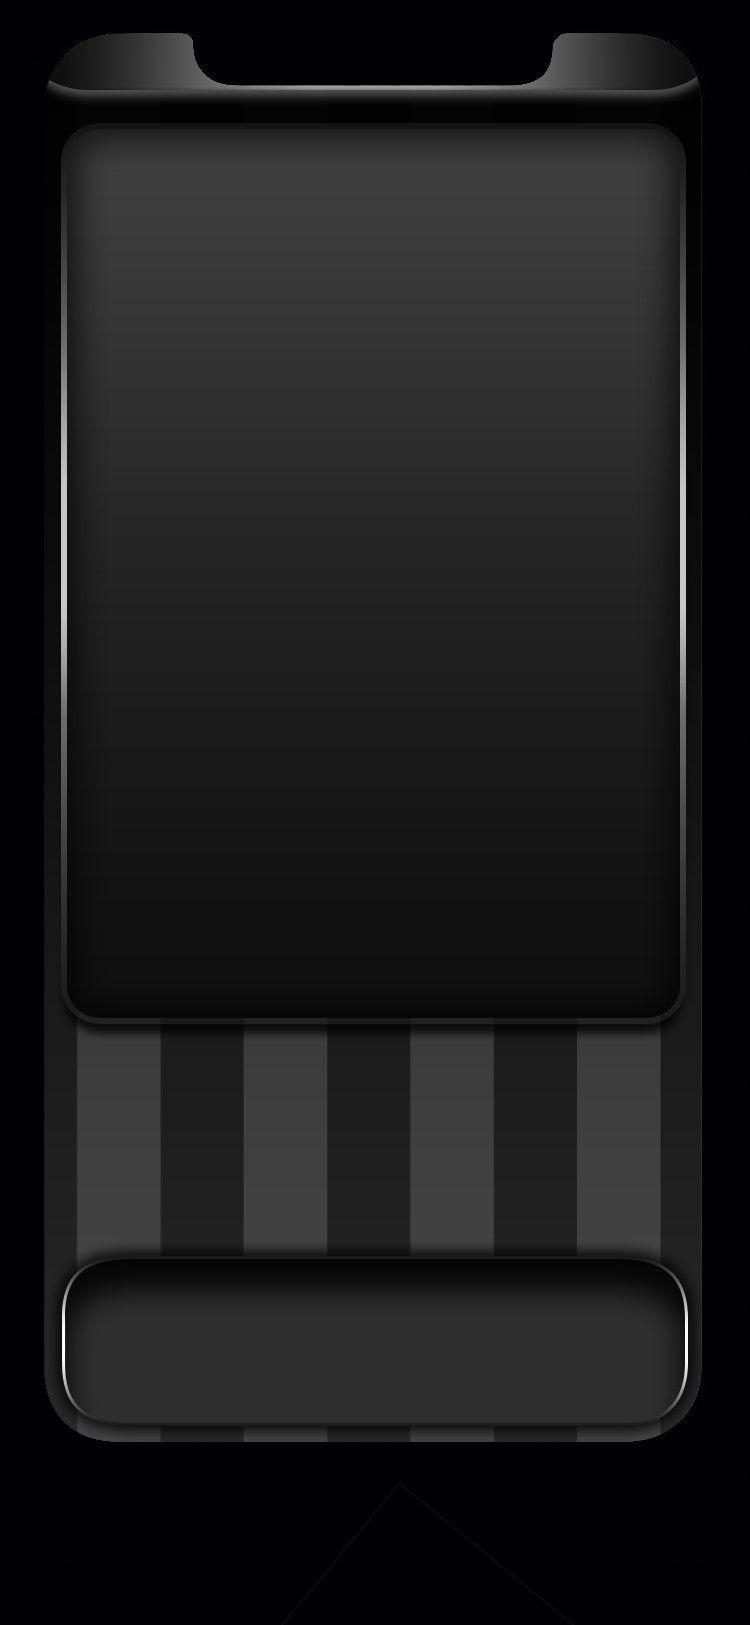 All Black Wallpaper Iphone Xr